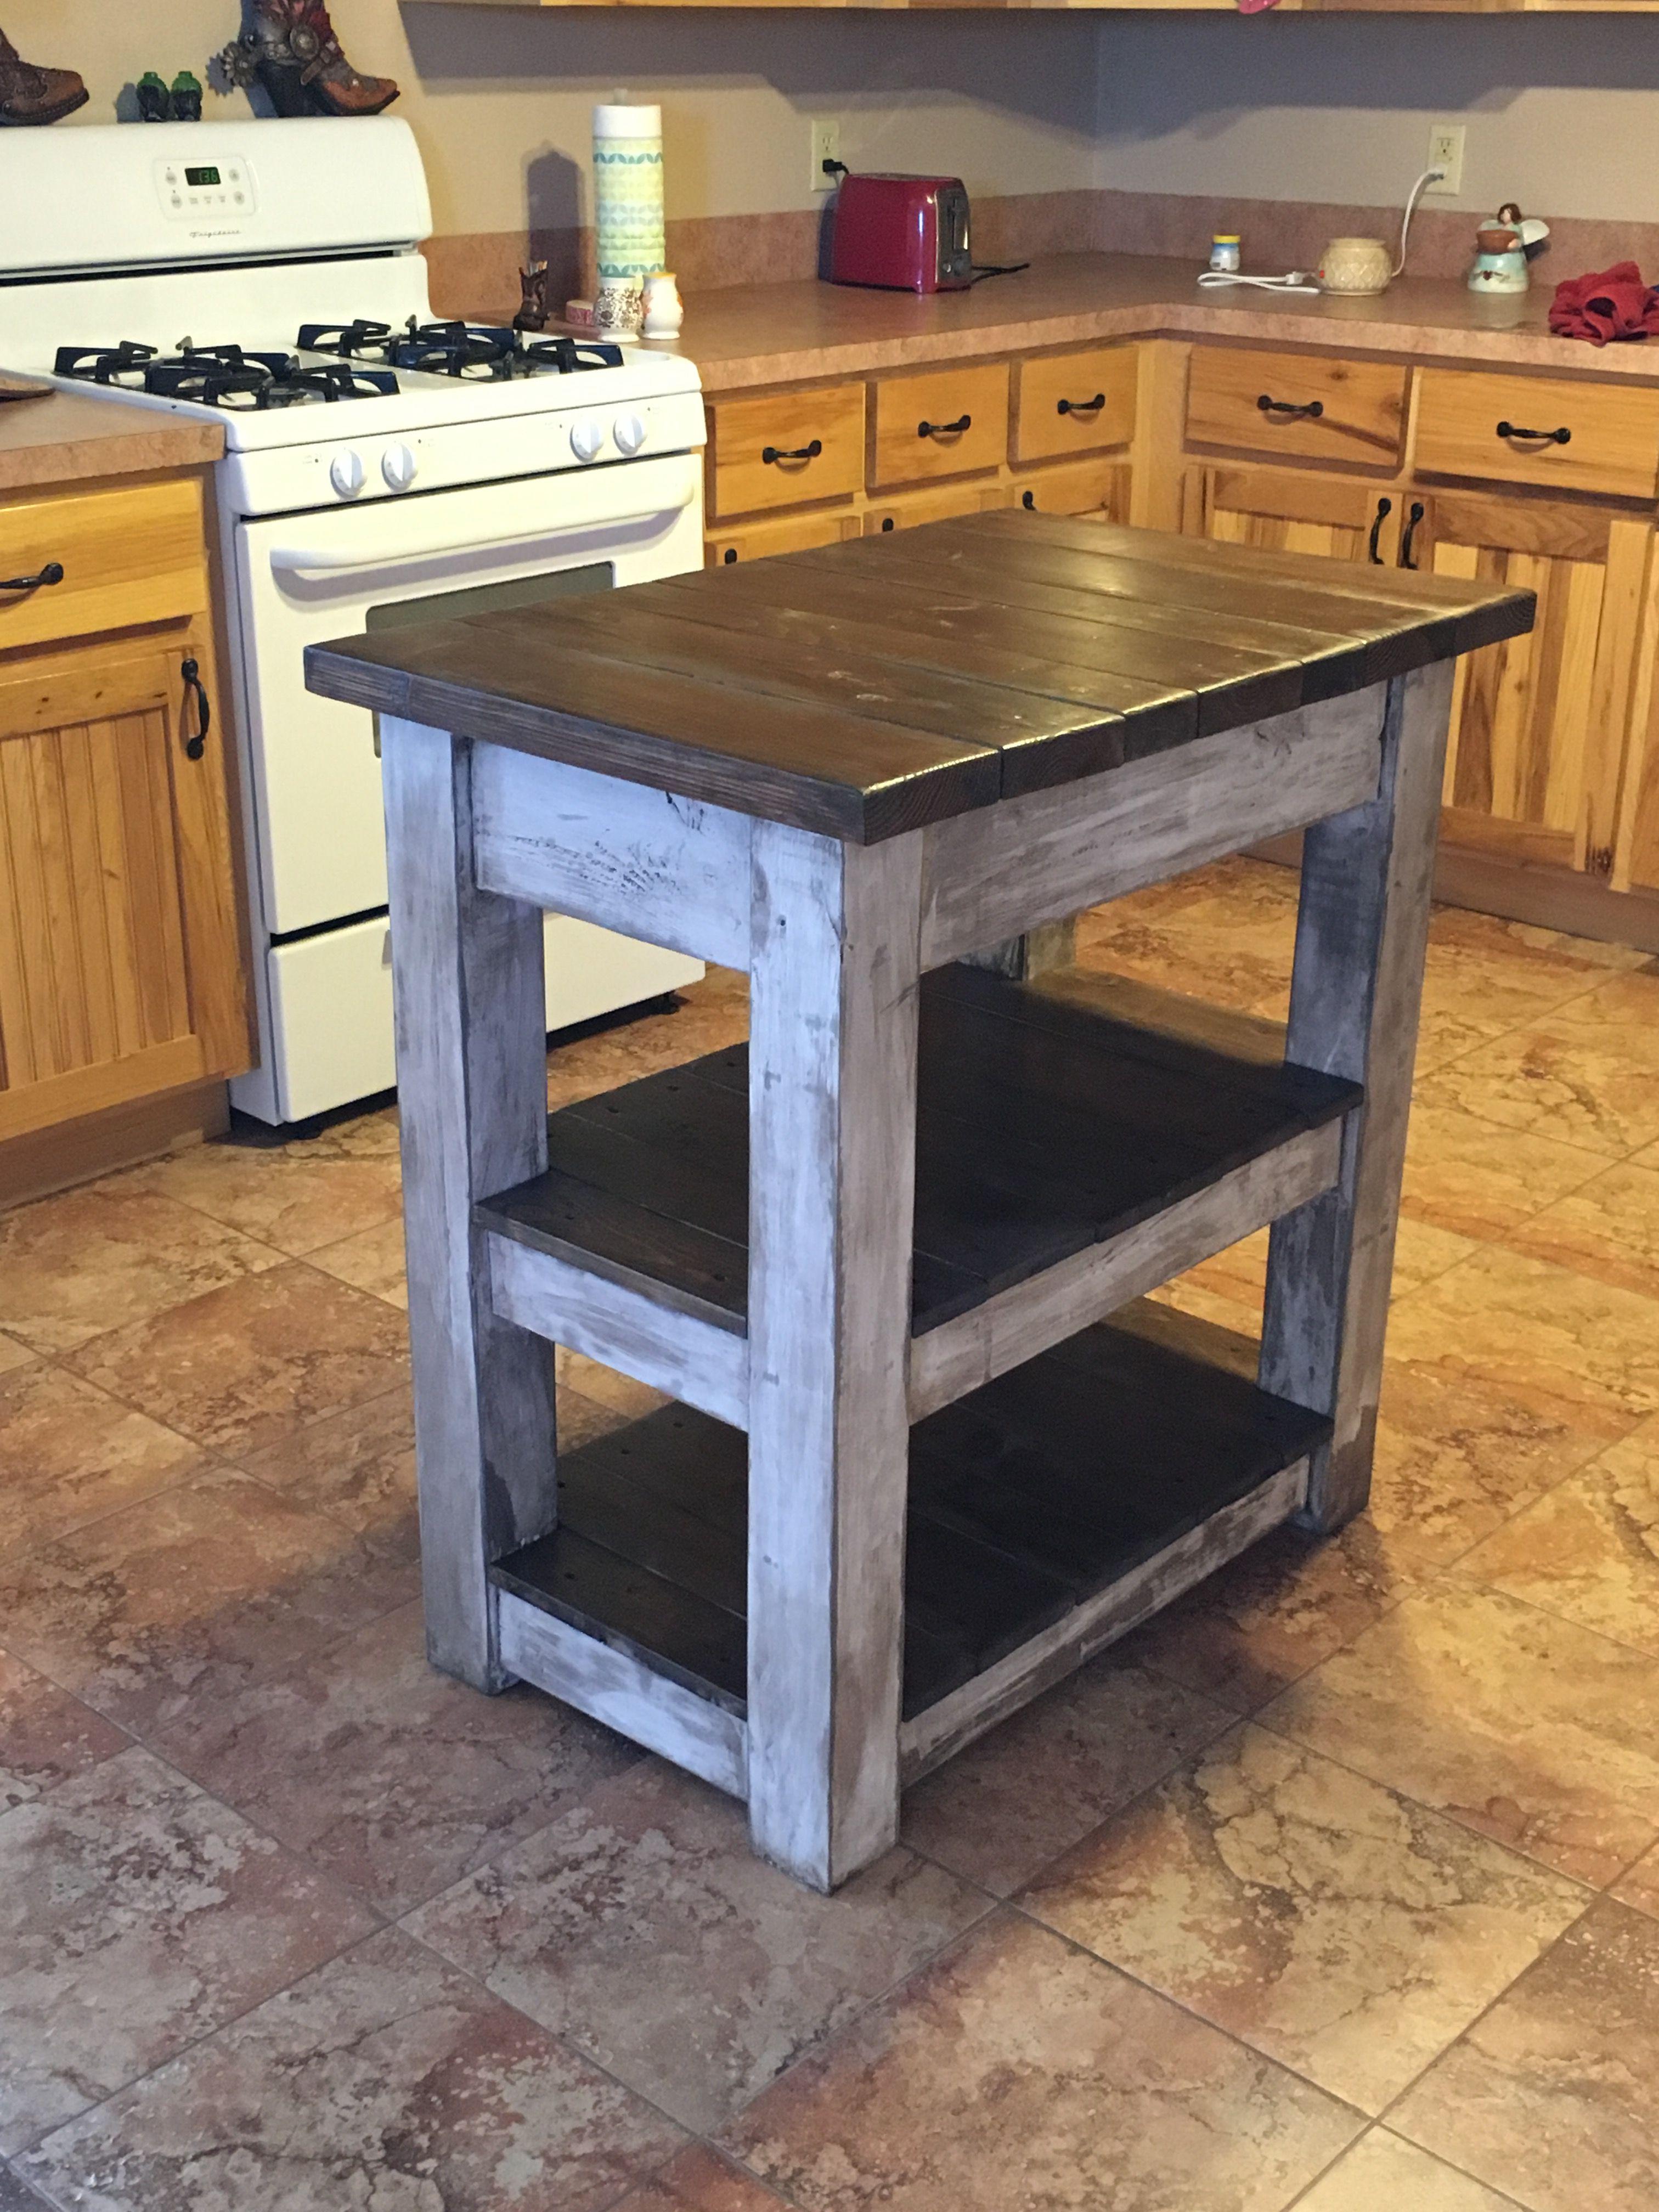 2x4 Kitchen Cabinets : kitchen, cabinets, Kitchen, Island, Legs,, Frame,, Shelf, 1x4's, Furniture,, Table, Makeover,, Design